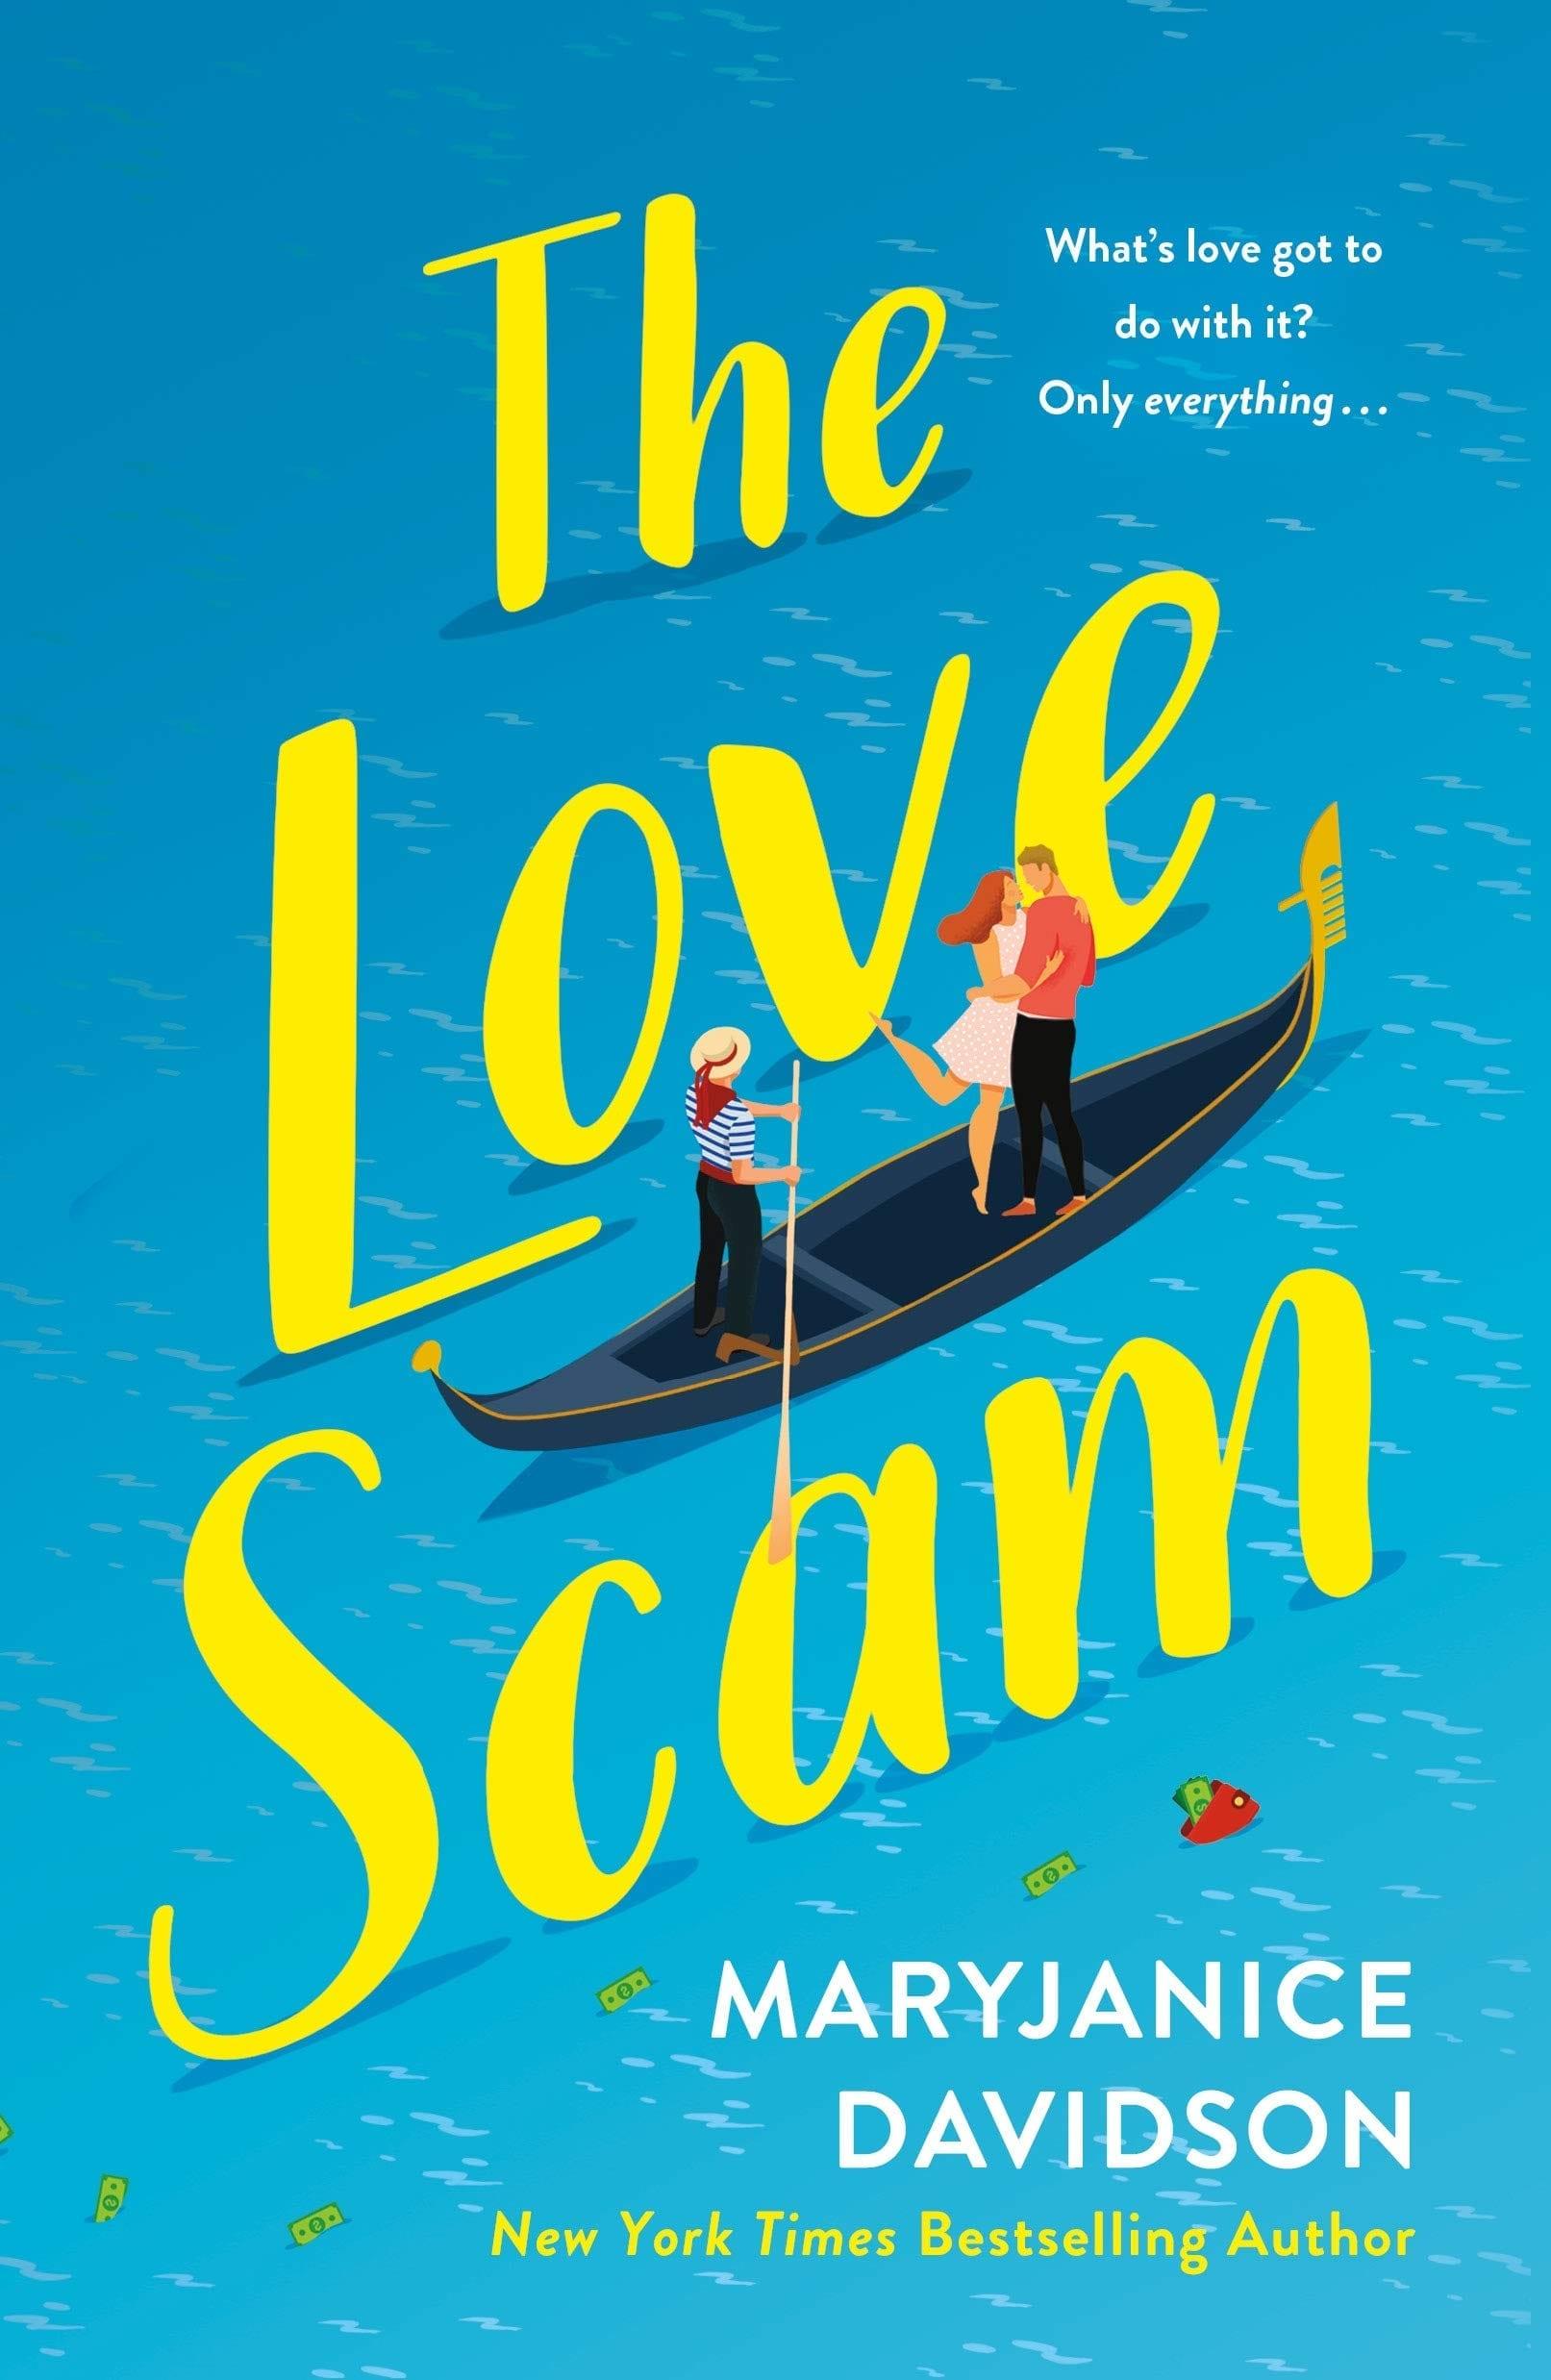 Summer Romances - The Love Scam